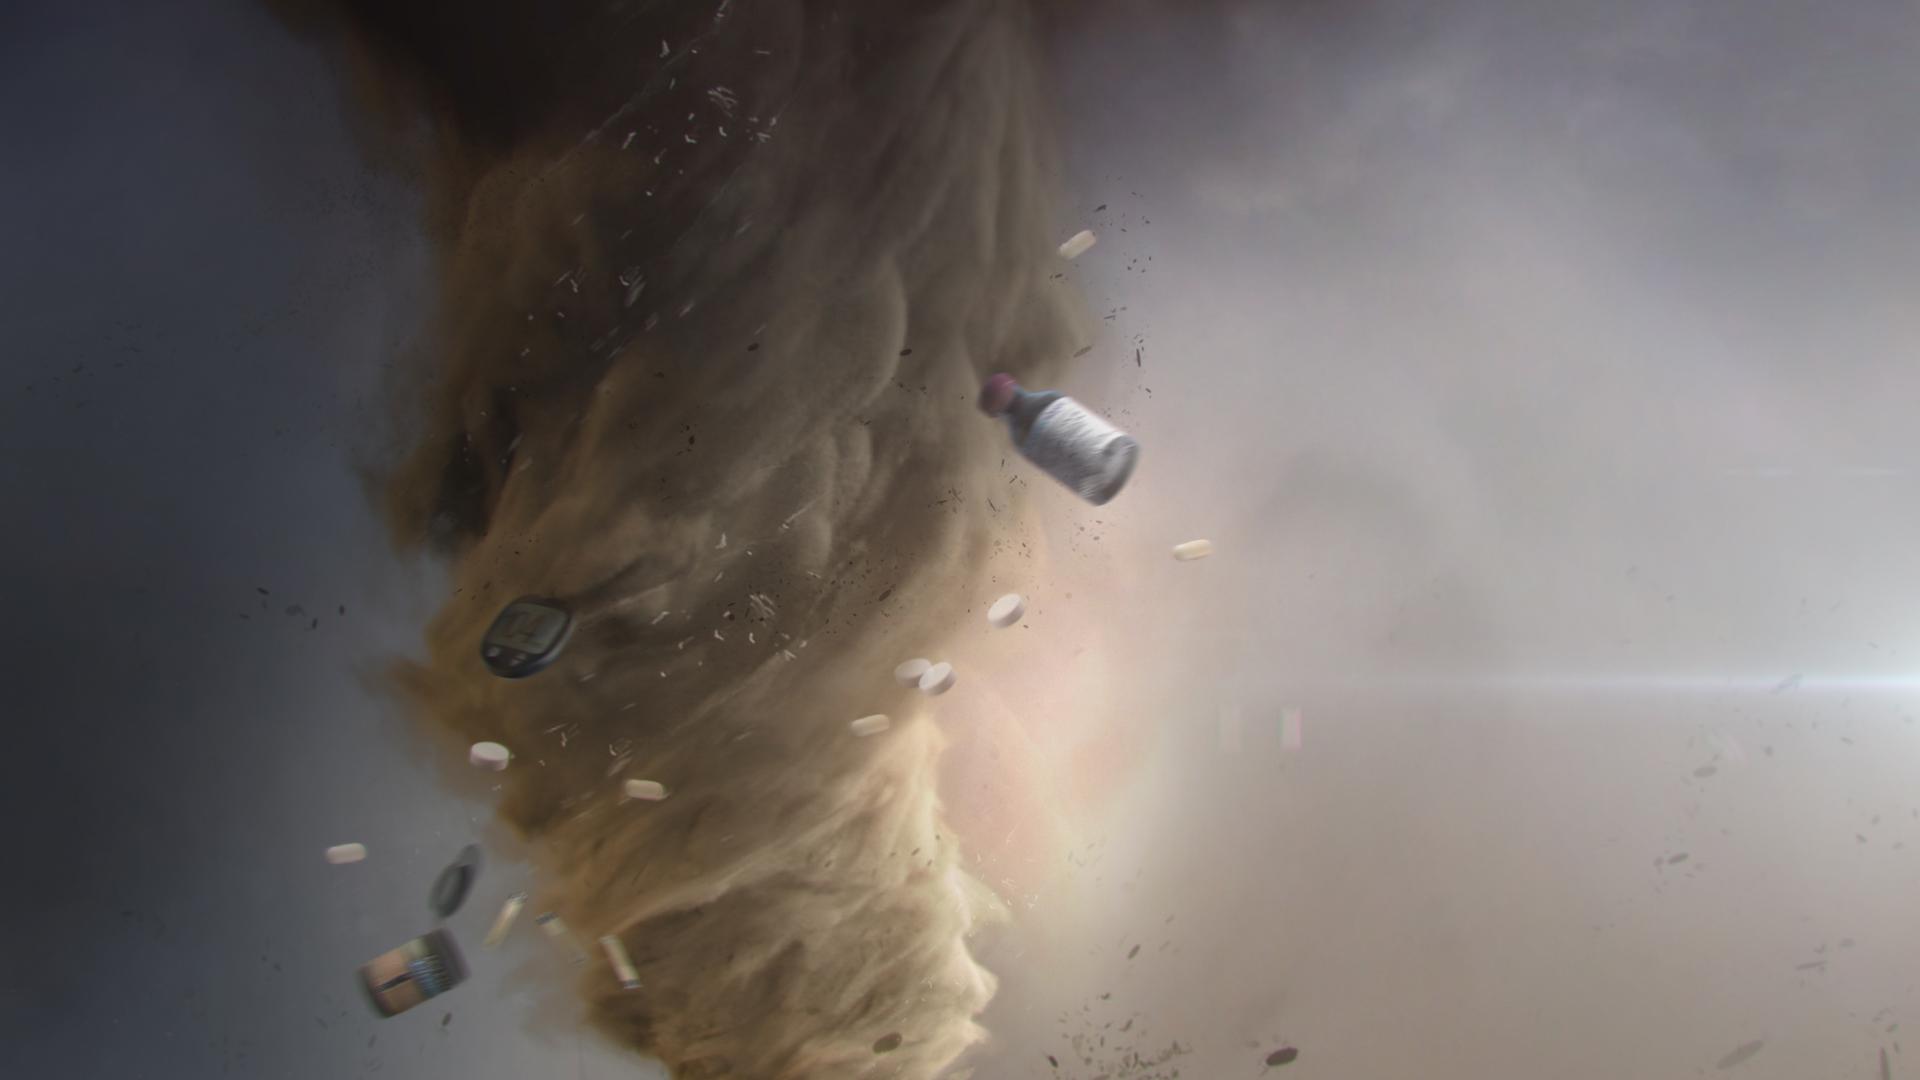 Tornado03_Flare2.jpg